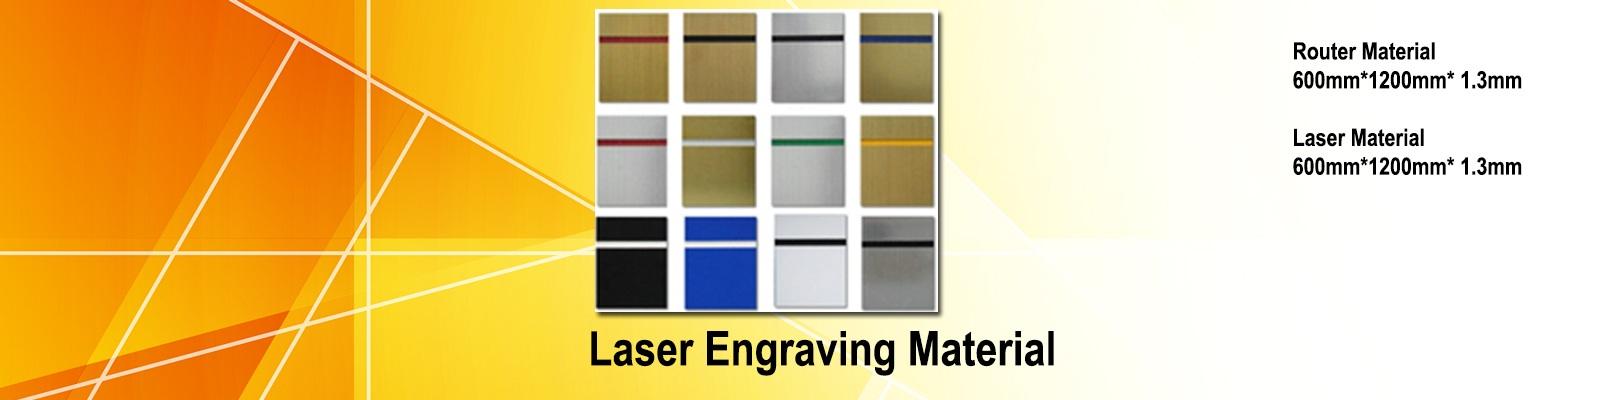 Laser Engraving Material by iPlastics